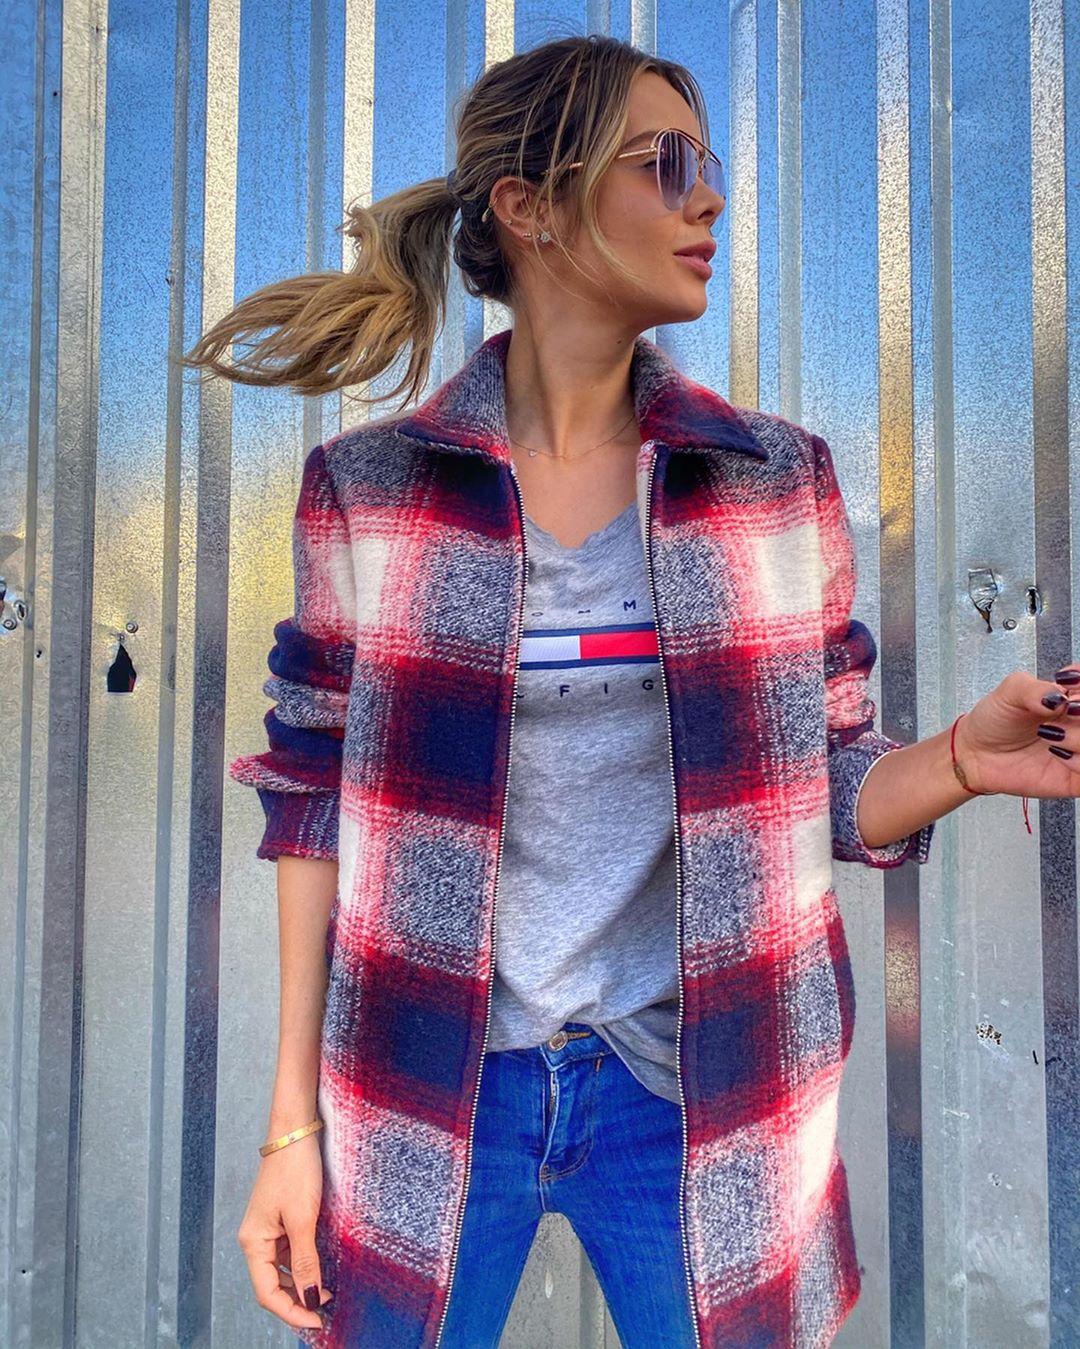 Alejandra-Buitrago-Wallpapers-Insta-Fit-BIo-1